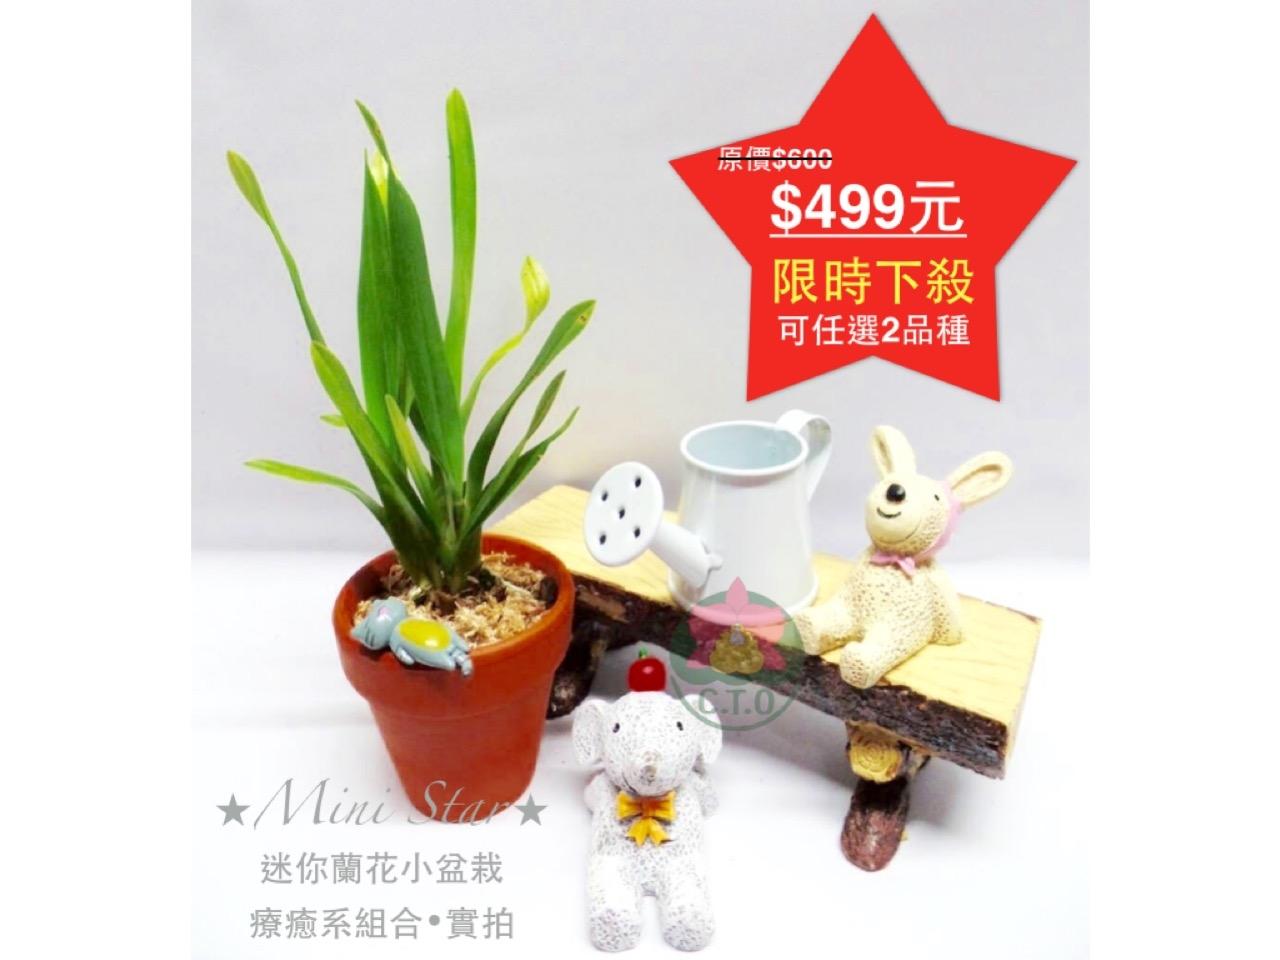 Mini Star千姿蘭園Chian-Tzy Orchids迷你蘭花文心蘭Oncidium-療癒系迷你蘭花盆栽組合